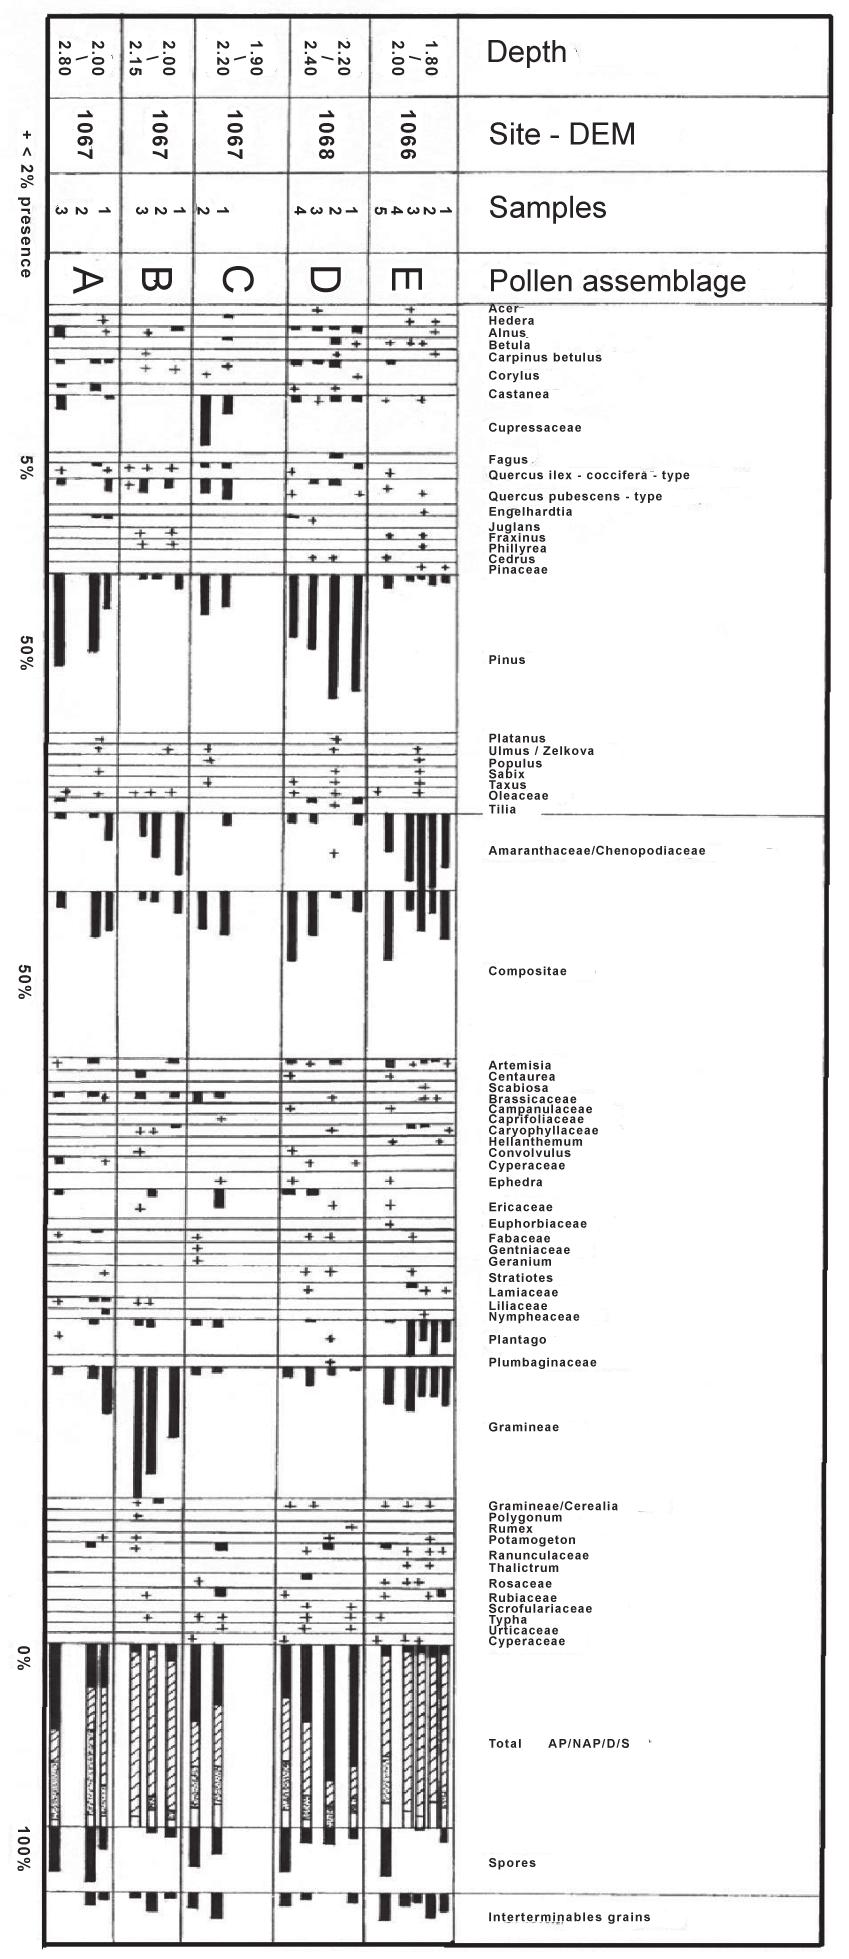 medium resolution of palynological diagram of sarakenos cave kopais basin